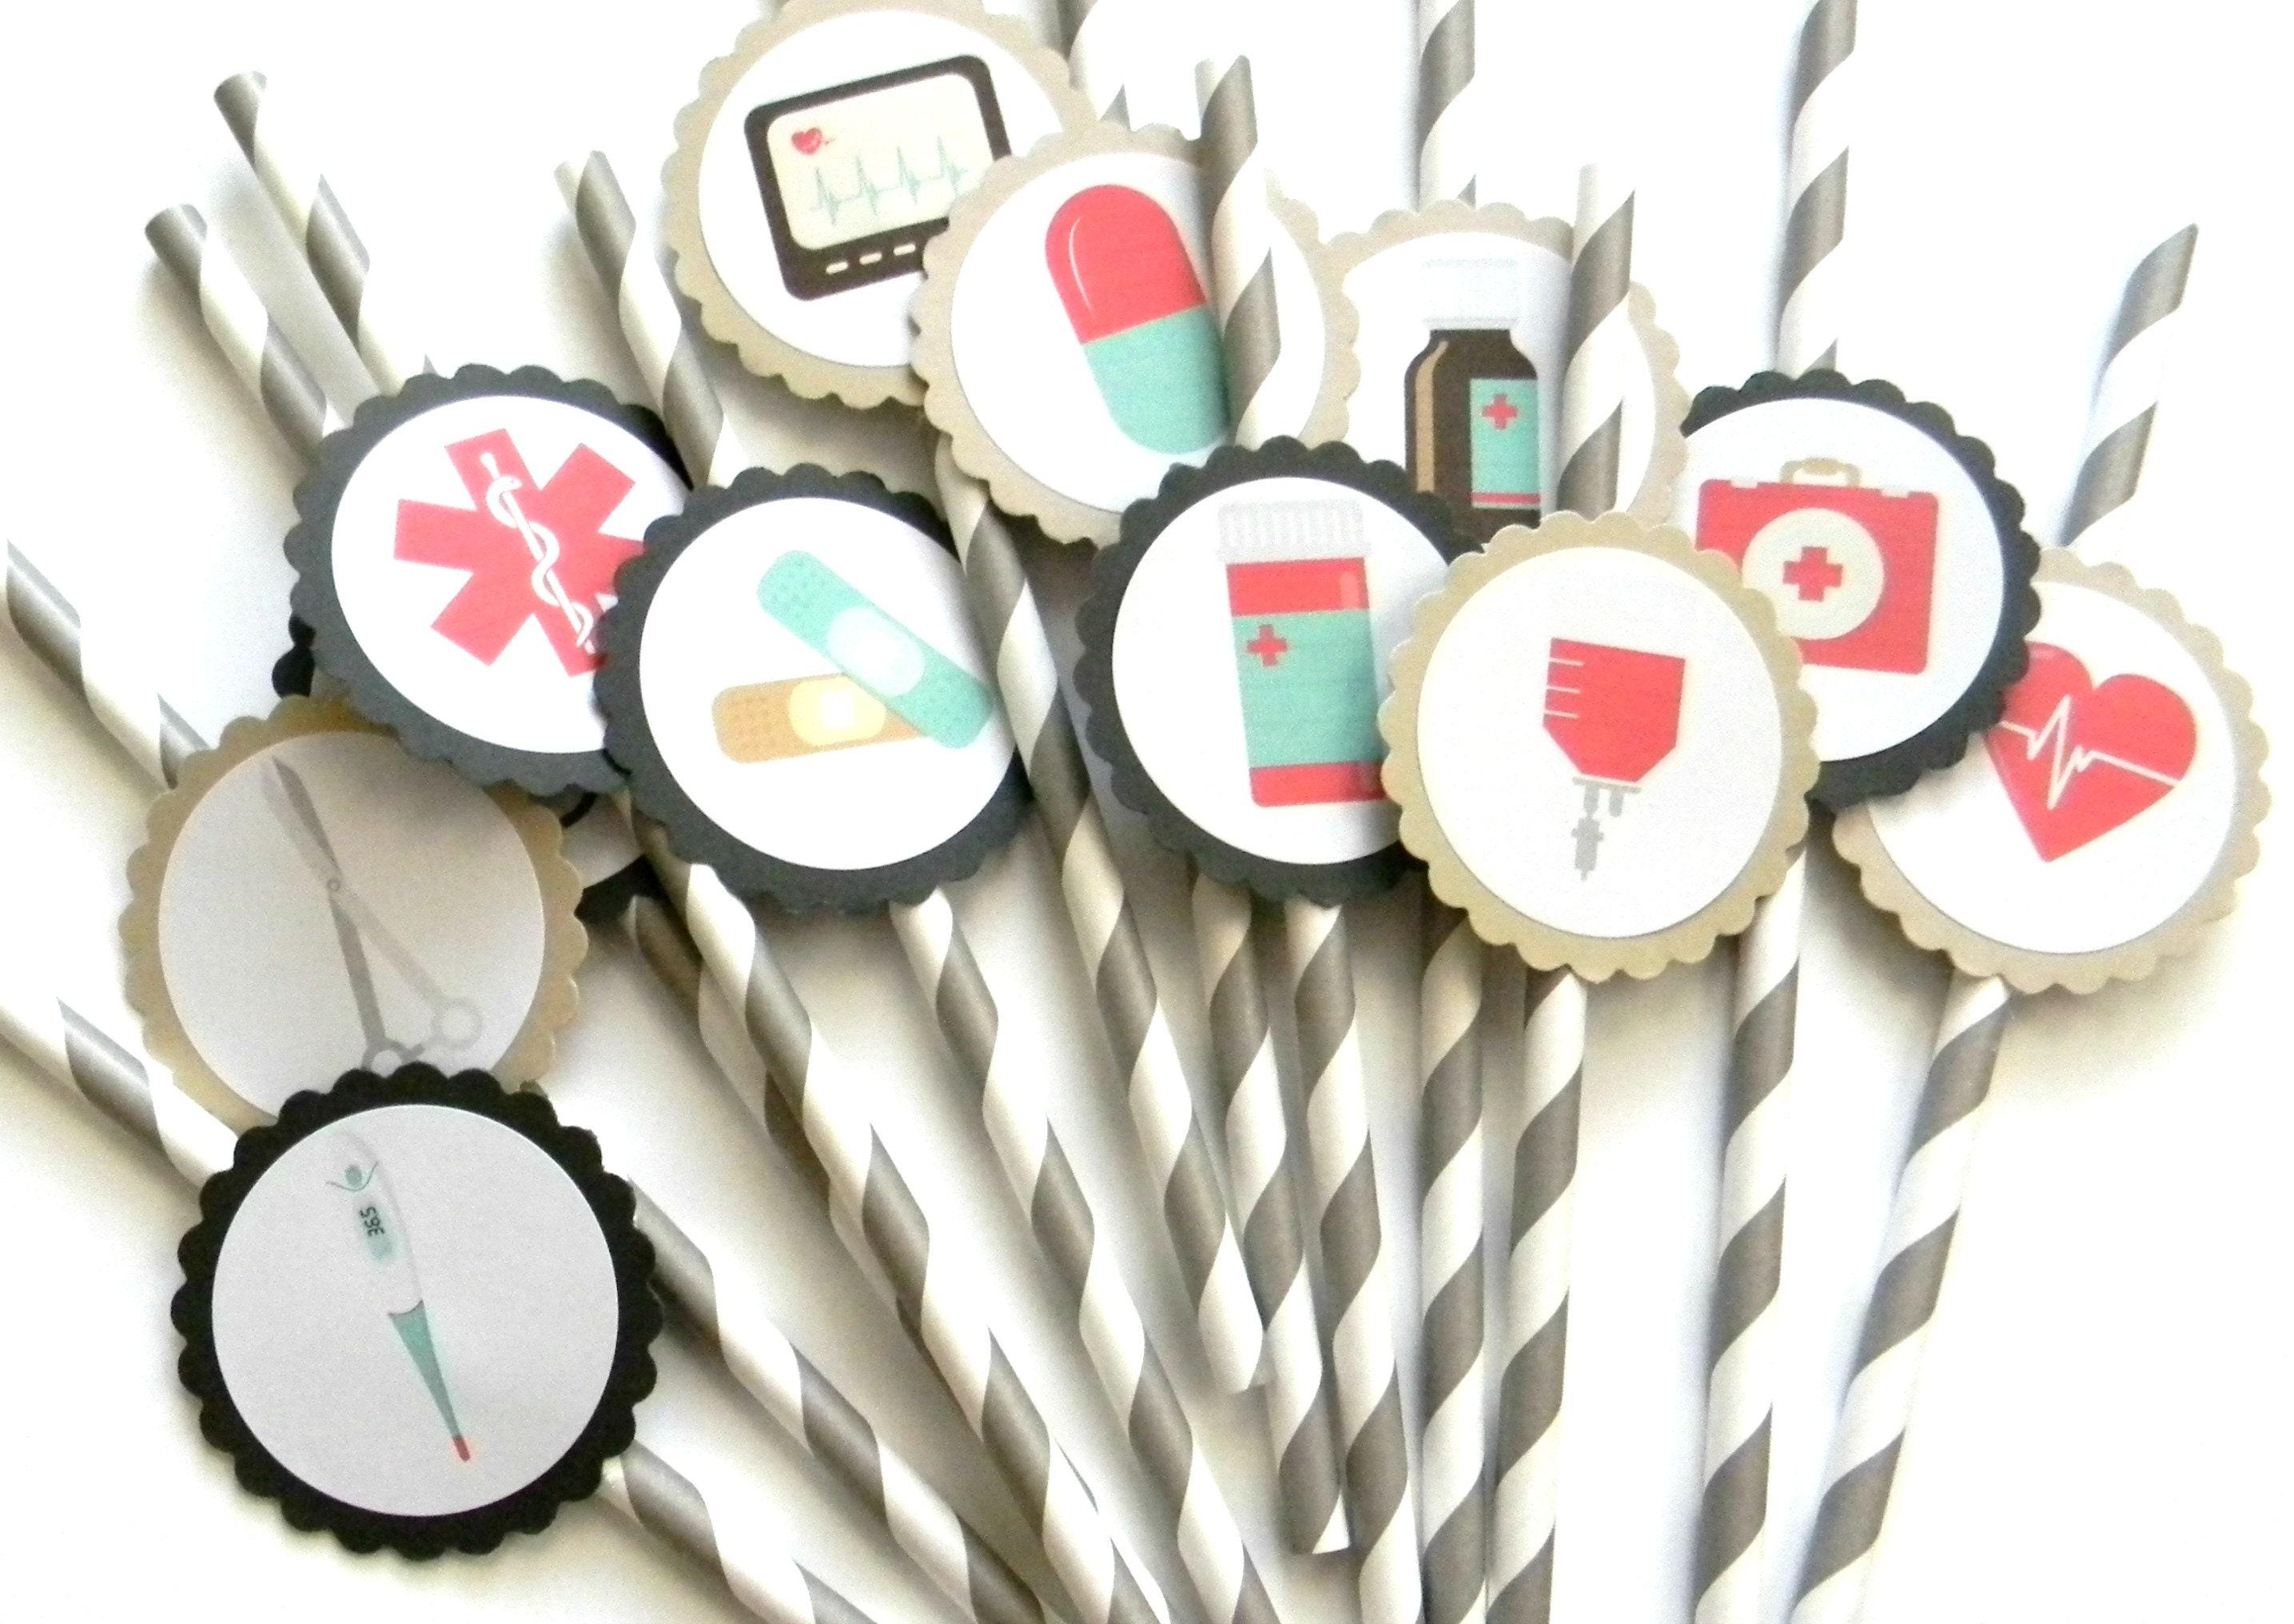 12 Vintage Medical Party Straws Doctor Theme Birthday